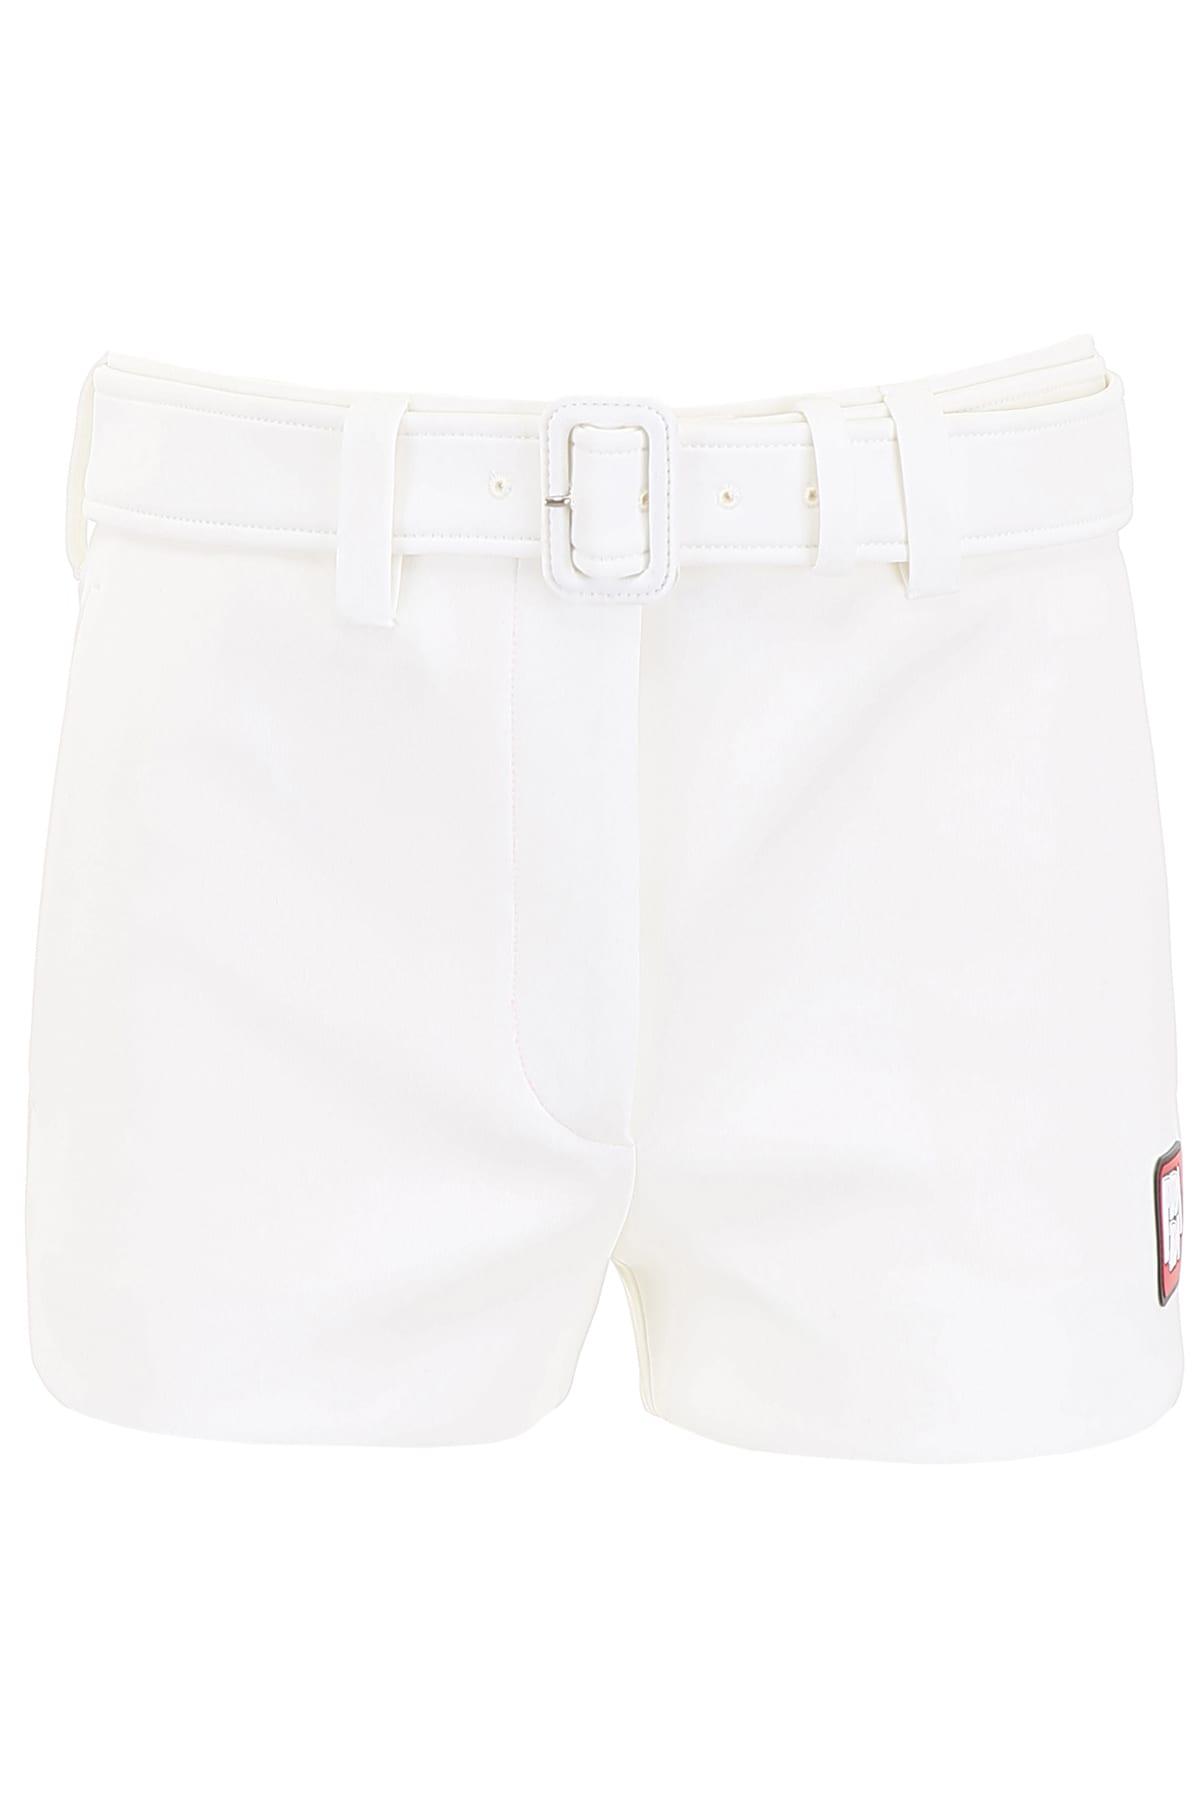 Prada Shorts With Rubber Logo